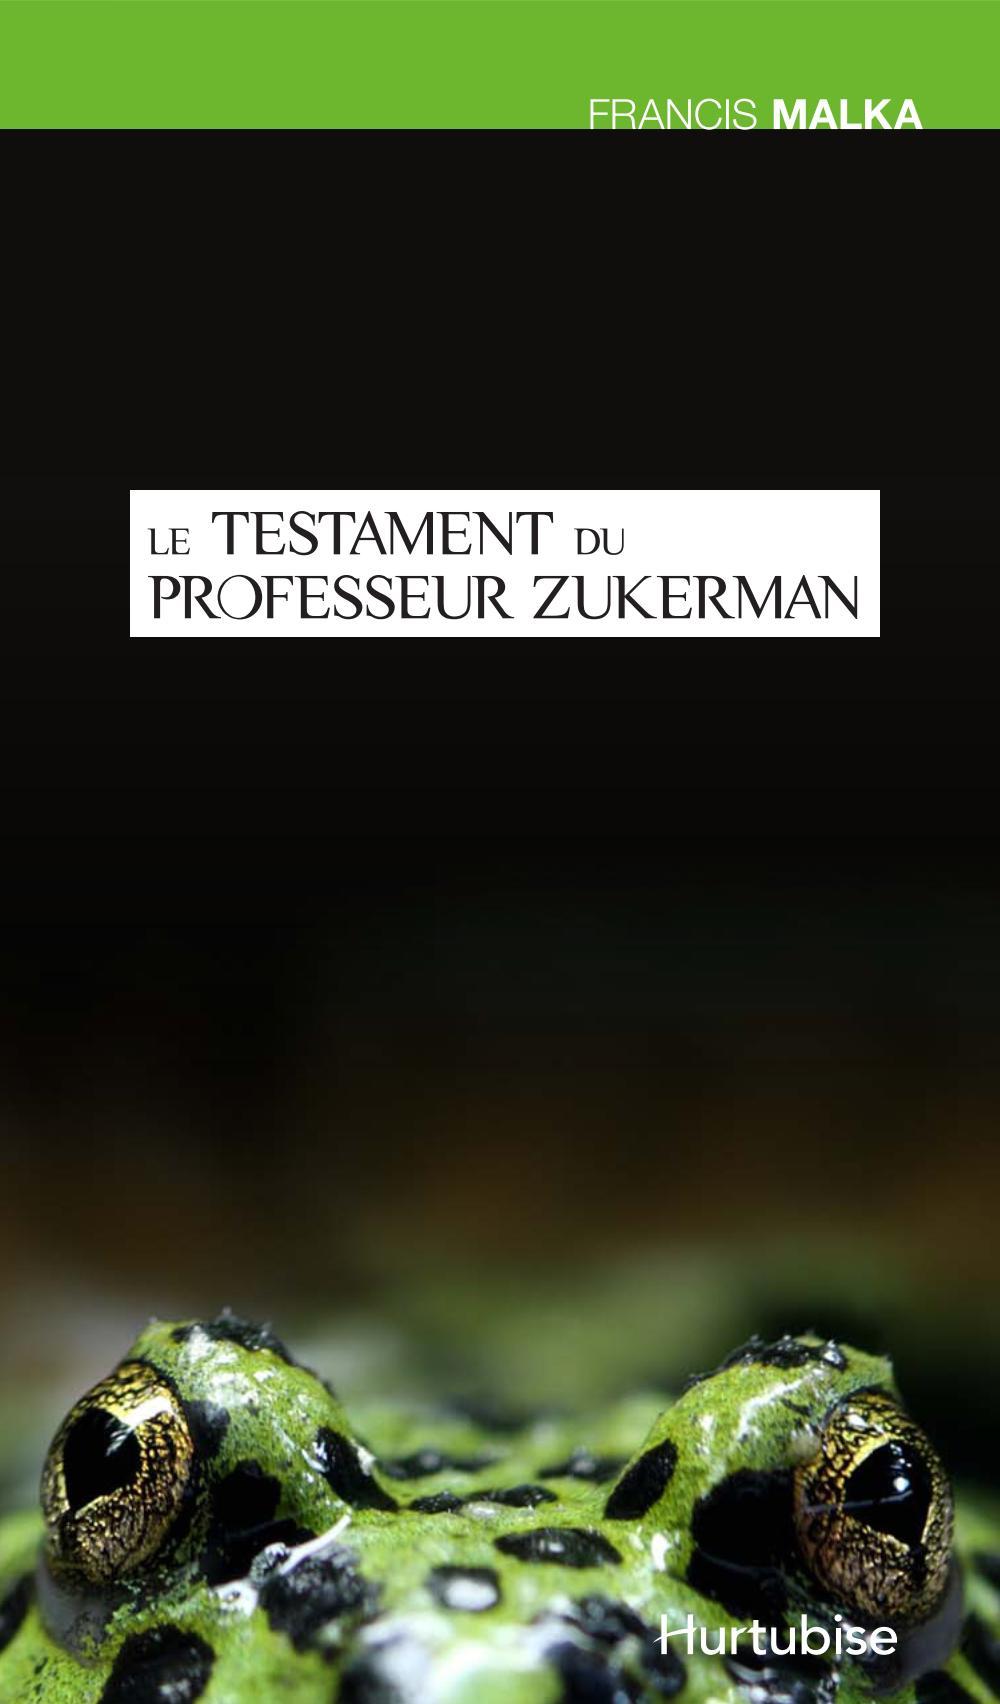 Le testament du professeur Zukerman